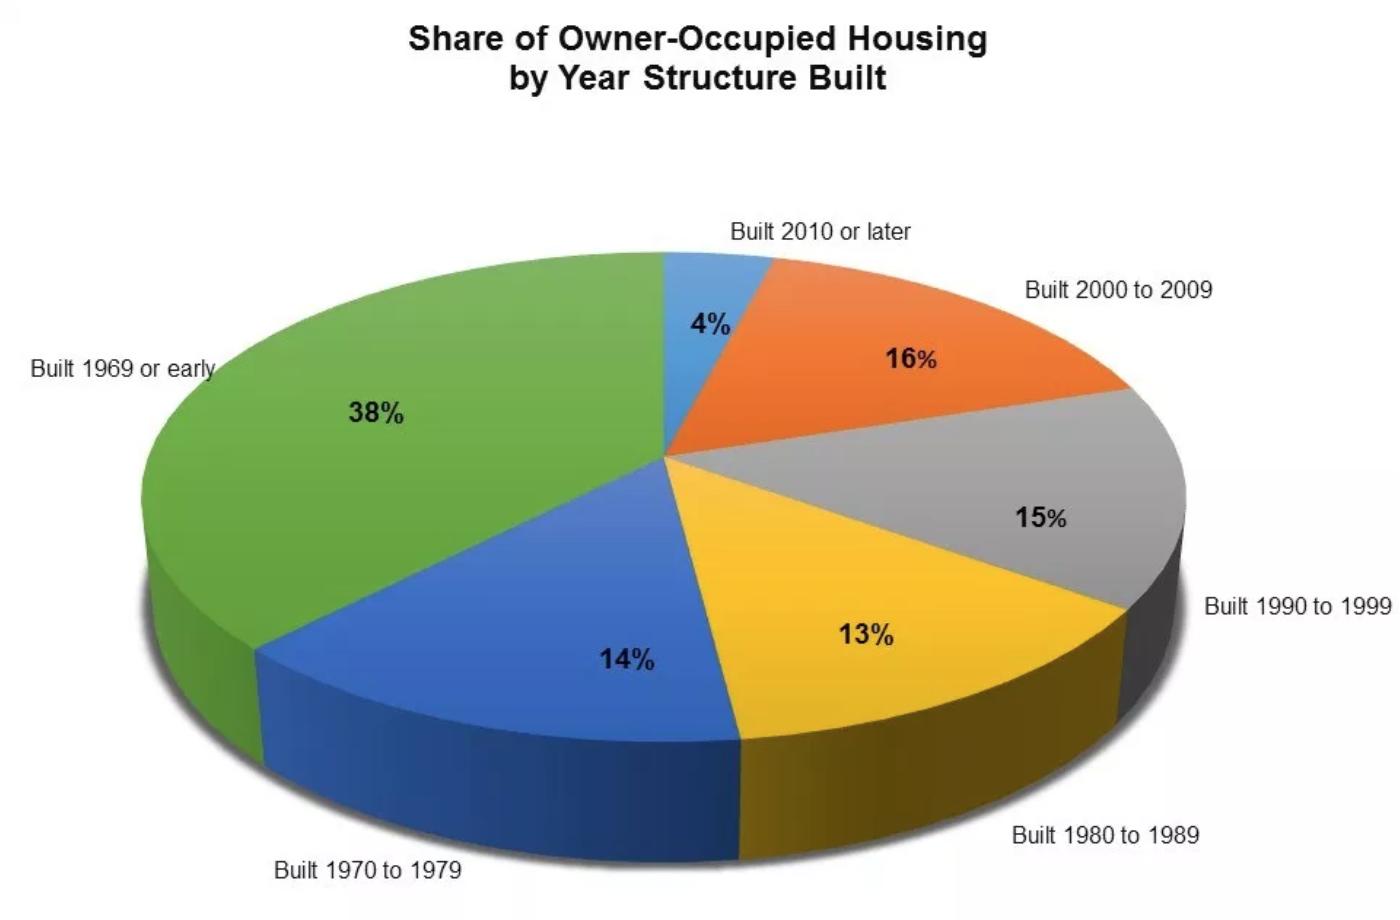 Housing stock age